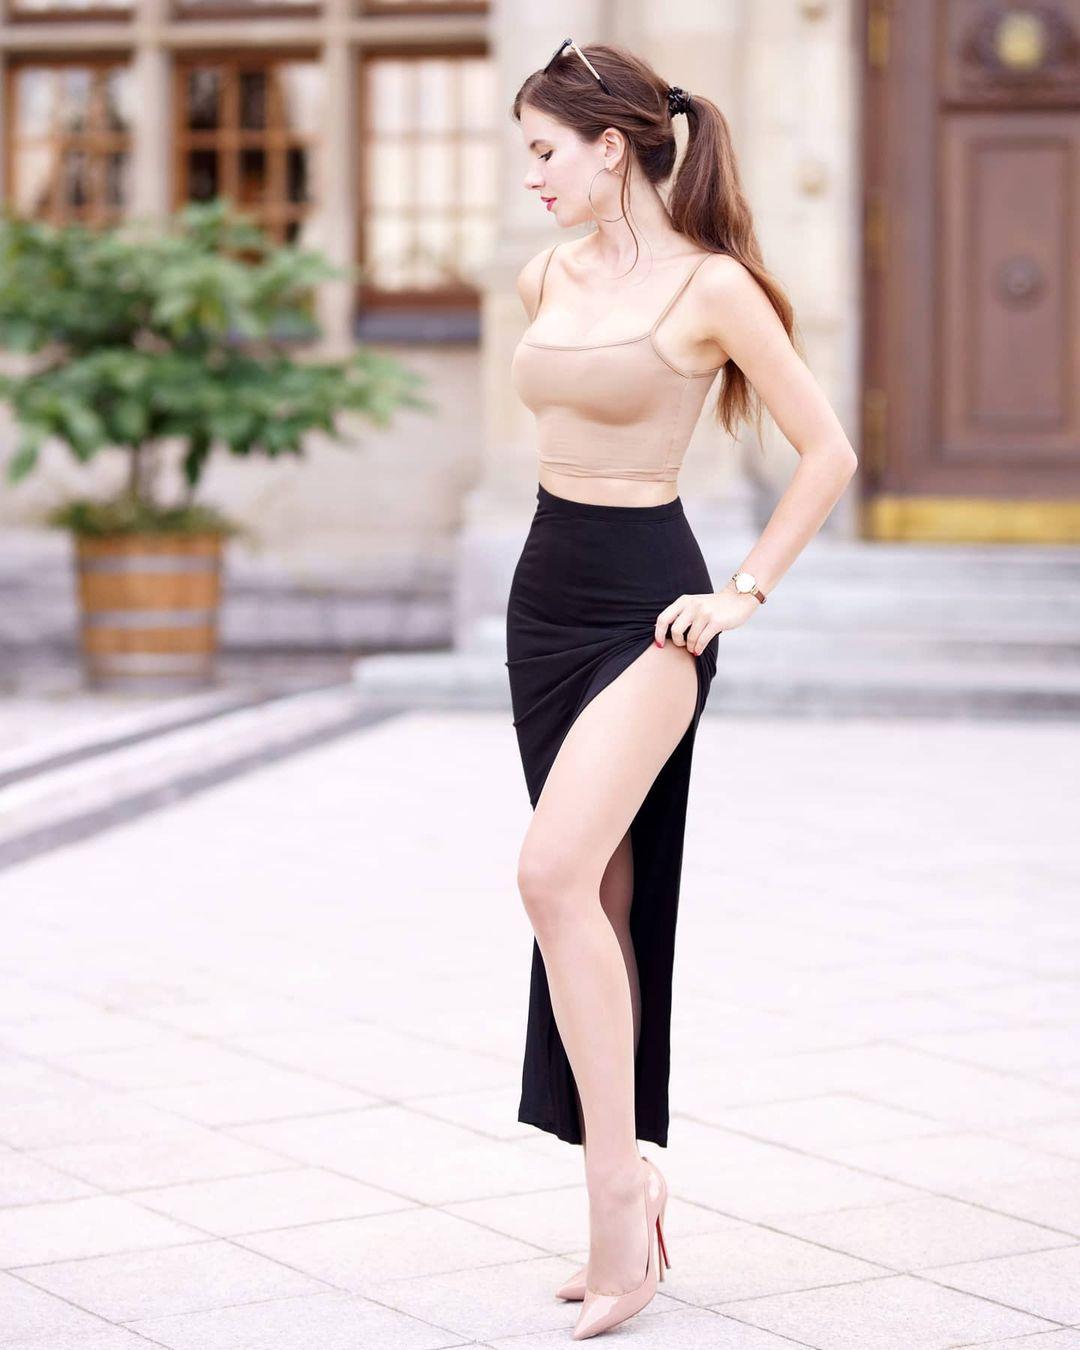 Ariadna - девушка дня из инстаграм (27 Фото) 7